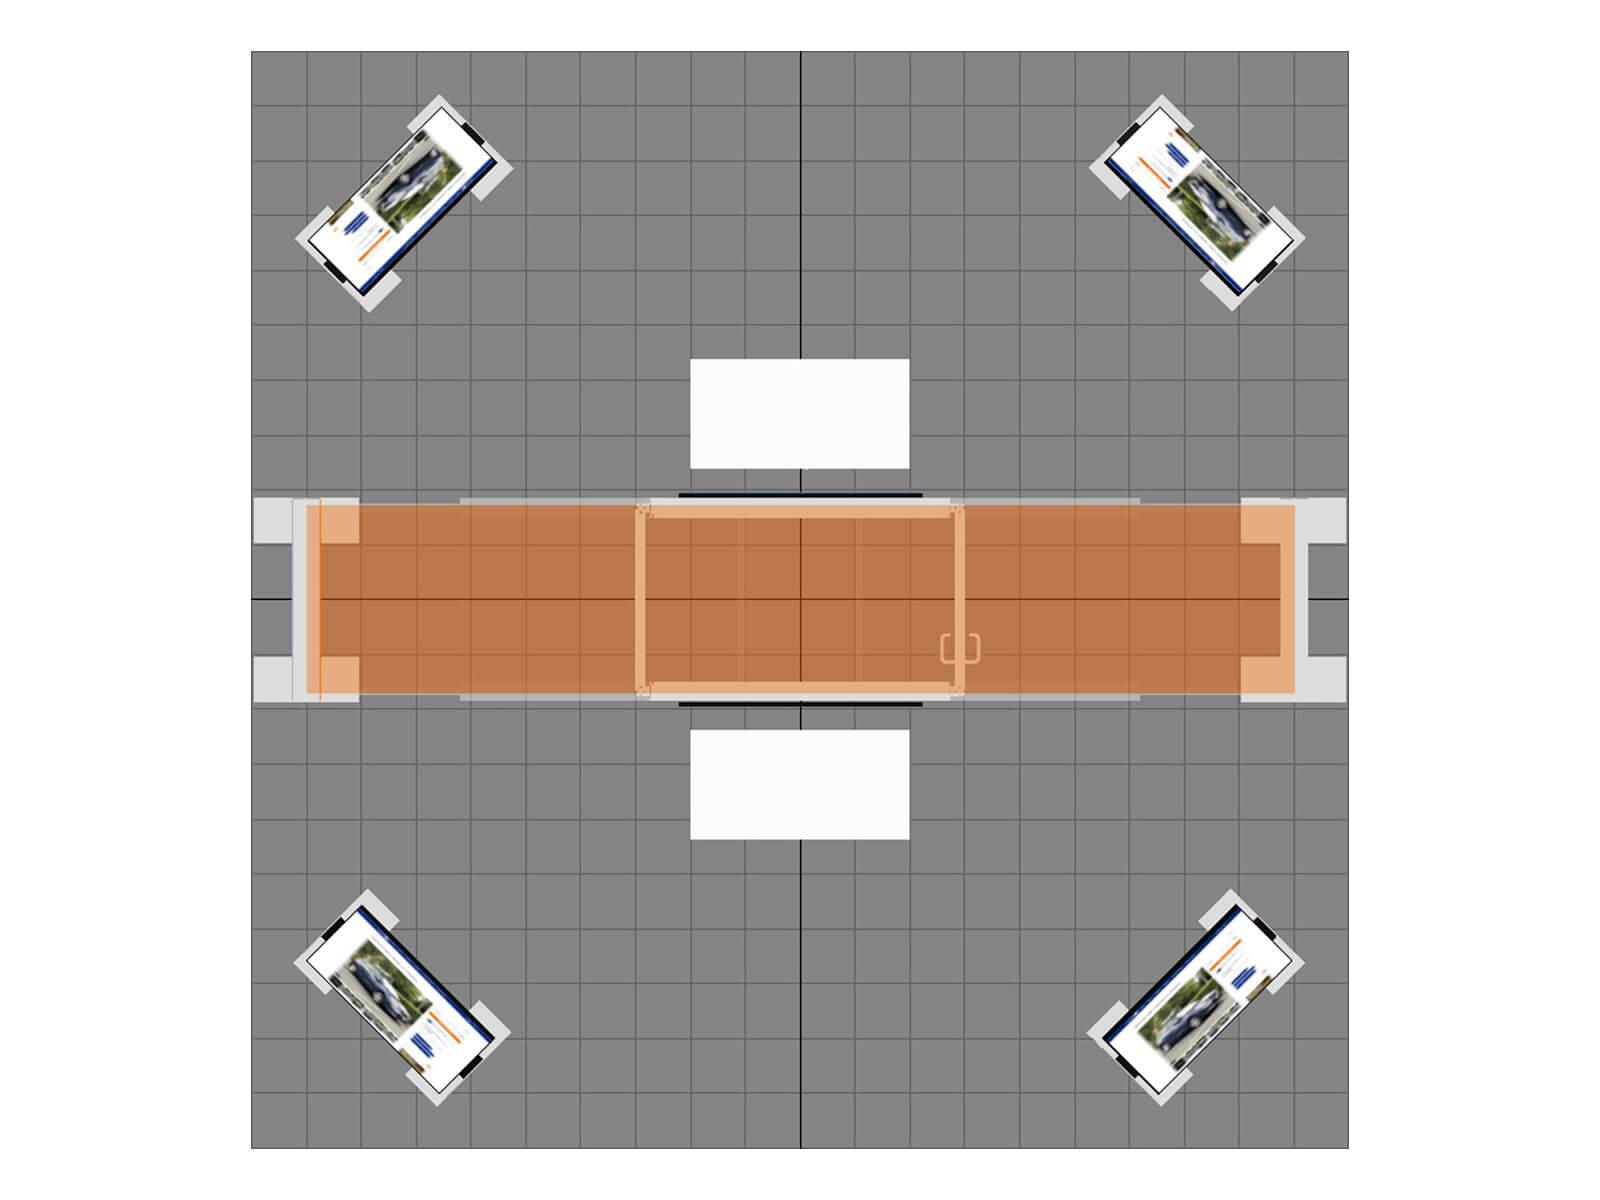 VK-5169 Island Tower - plan view